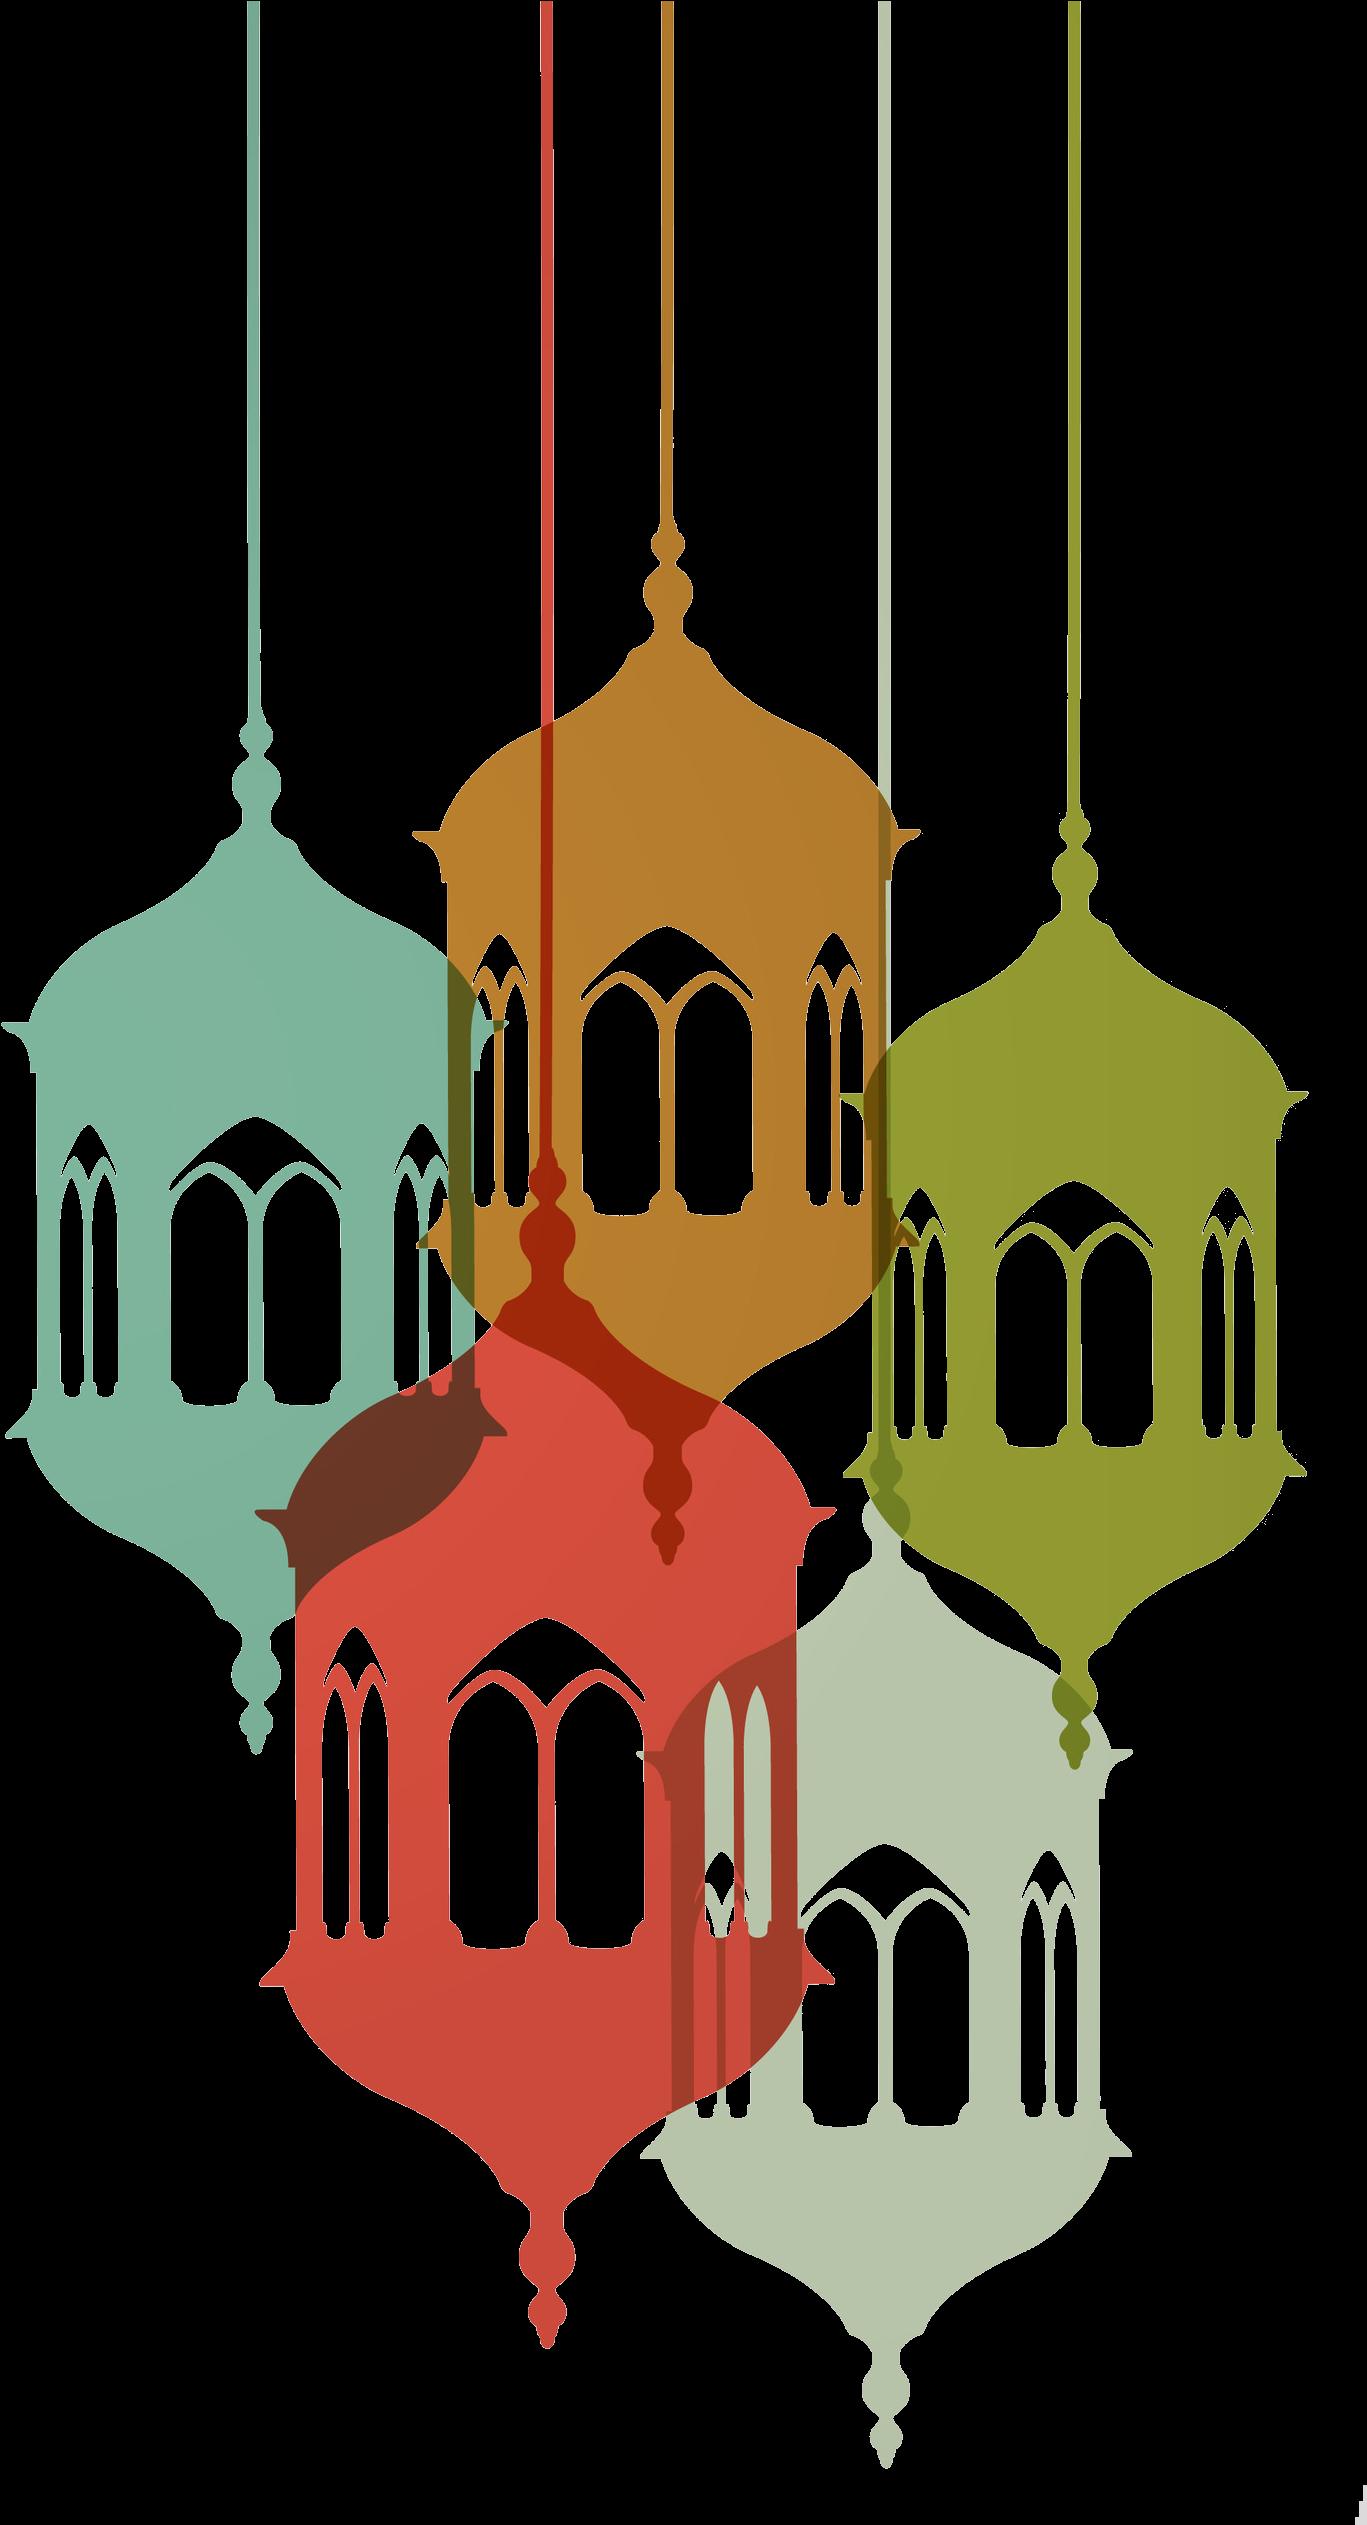 Fanoos ramadan clipart clipart transparent download Chandelier Clipart Fanoos - Ramadan Clipart Png , Transparent ... clipart transparent download